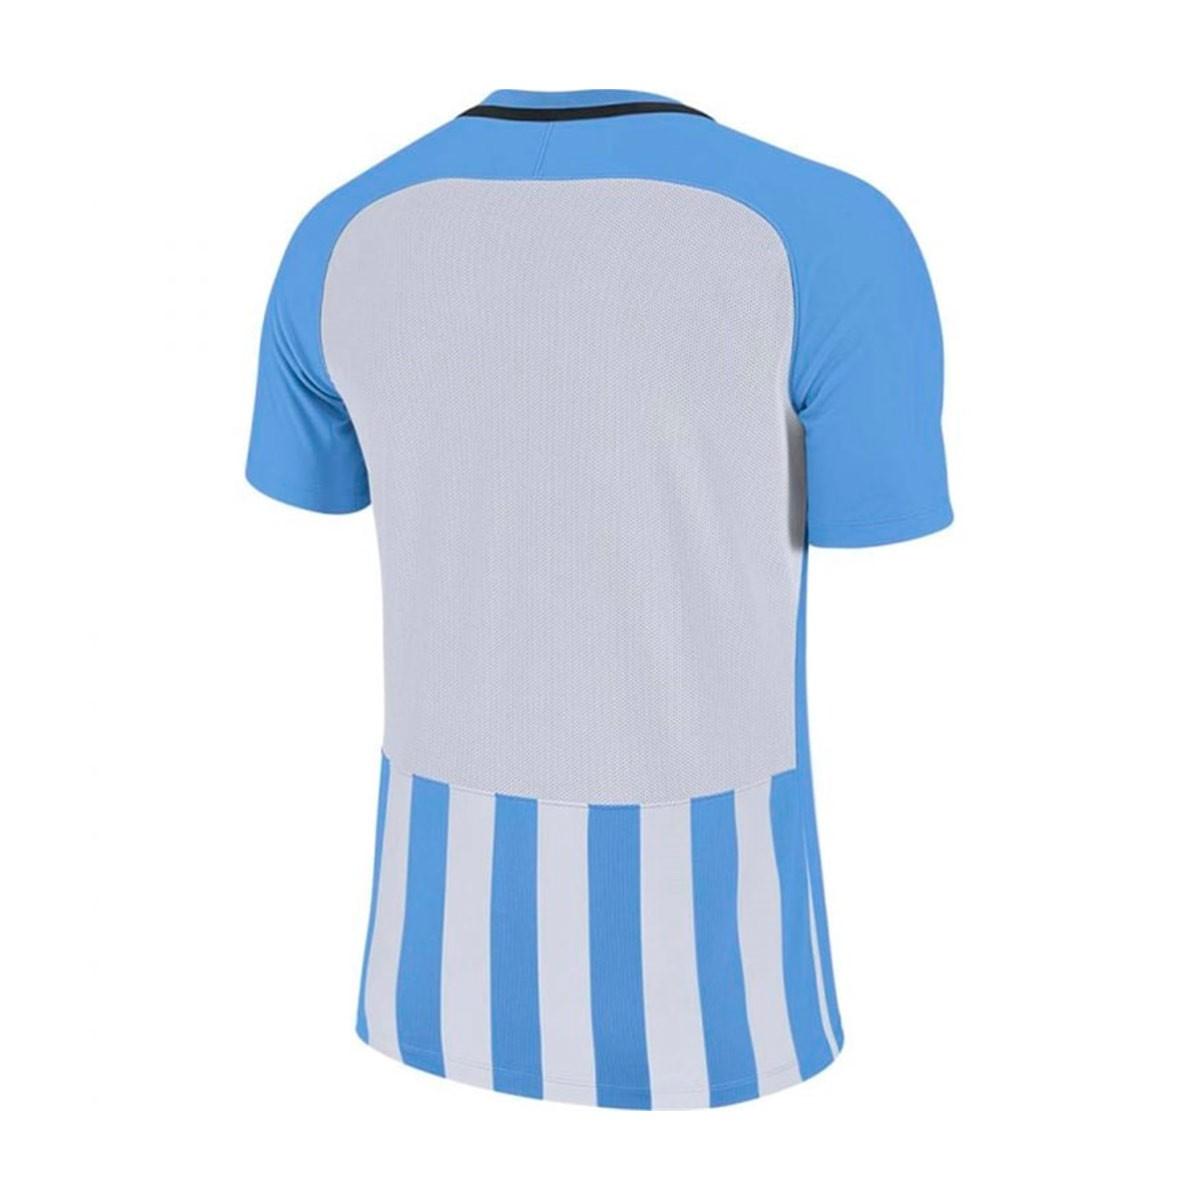 0e8832d2a1 Nike Kids Striped Division III m/c Jersey. University blue-White ...